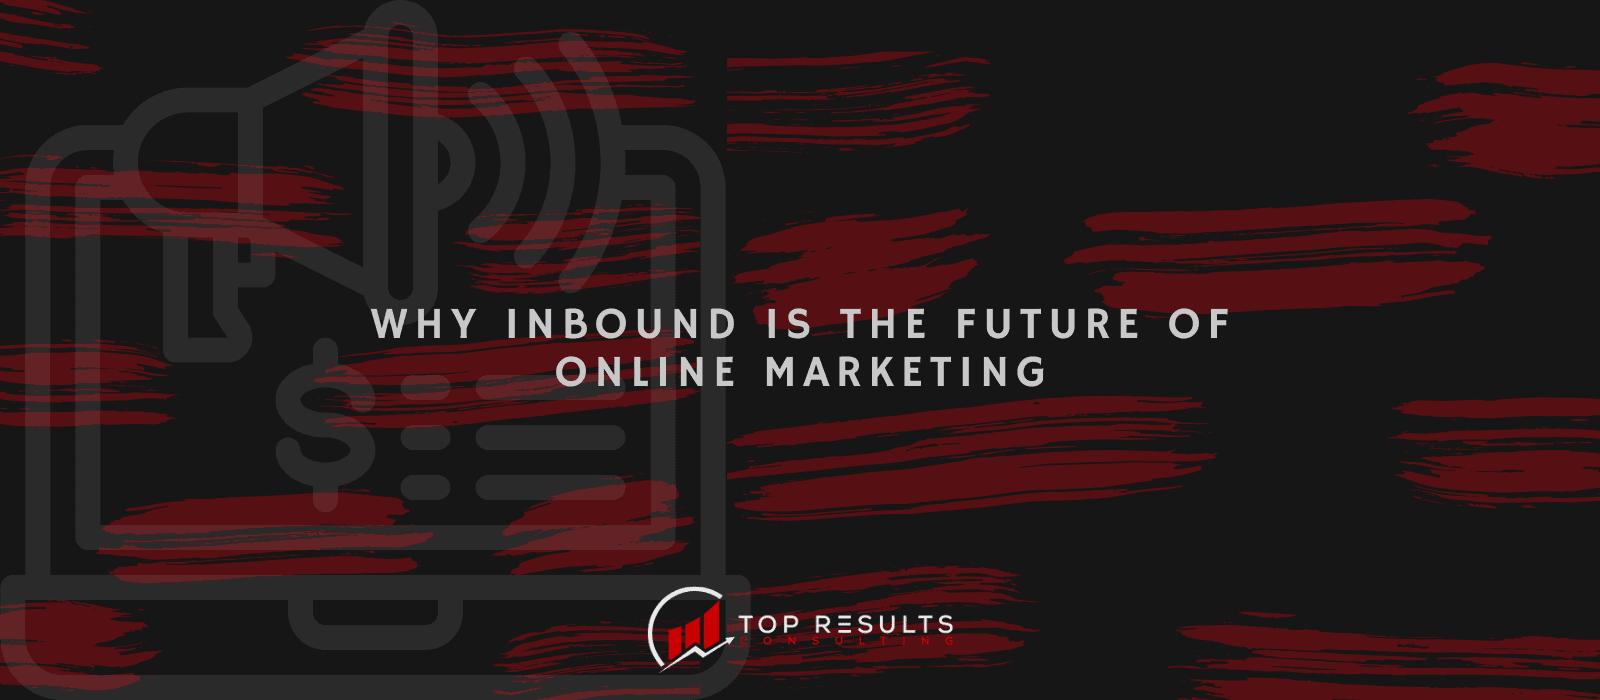 Inbound Is The Future Of Online Marketing